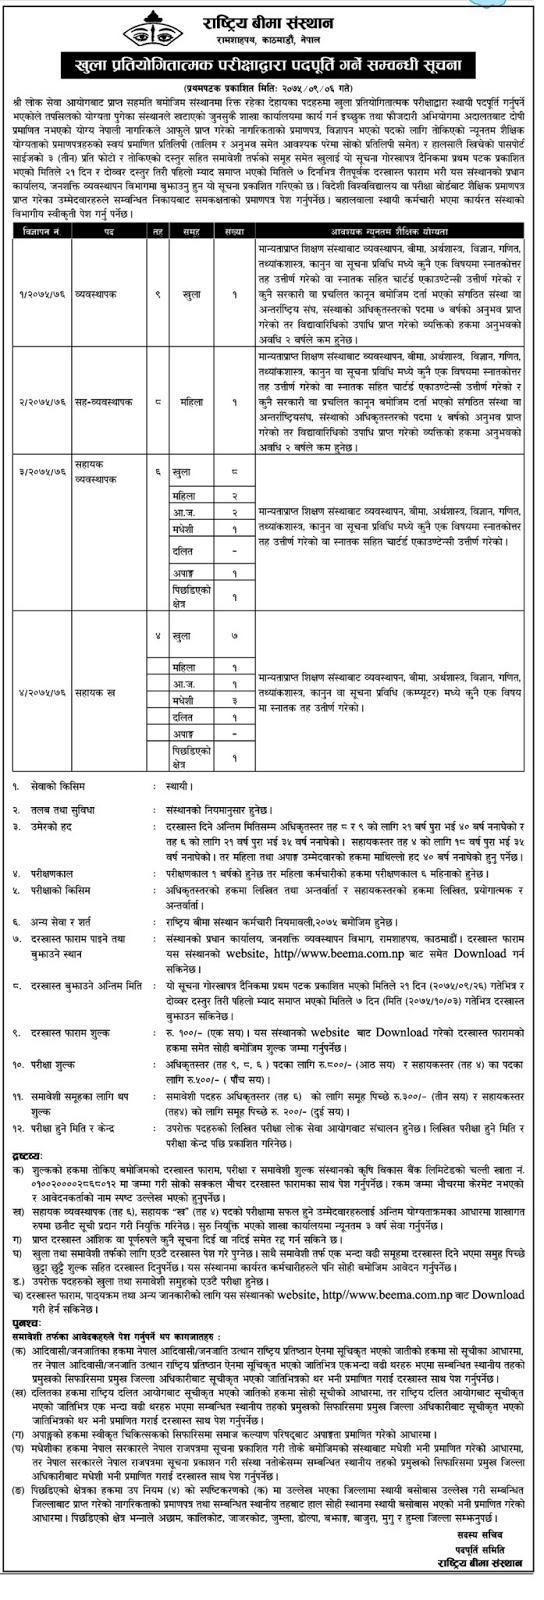 Vacancy Notice from Rastriya Beema Sansthan